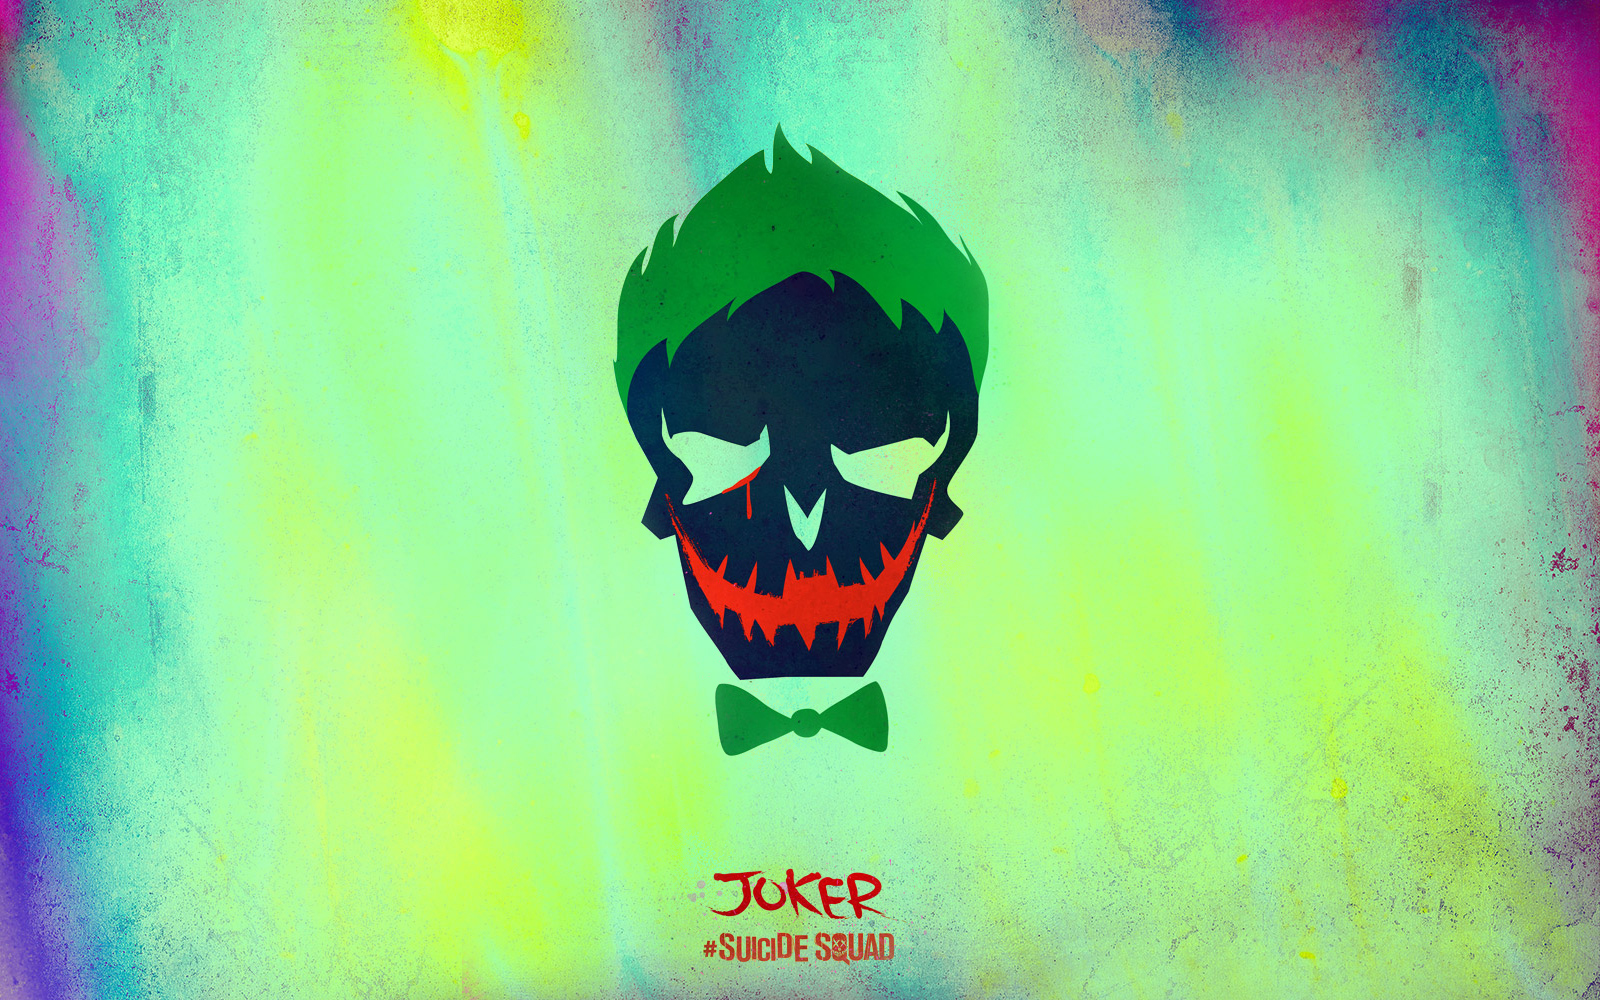 Hd wallpaper joker - Fondos Escuadr 243 N Suicida Wallpapers Suicide Squad Pelicula